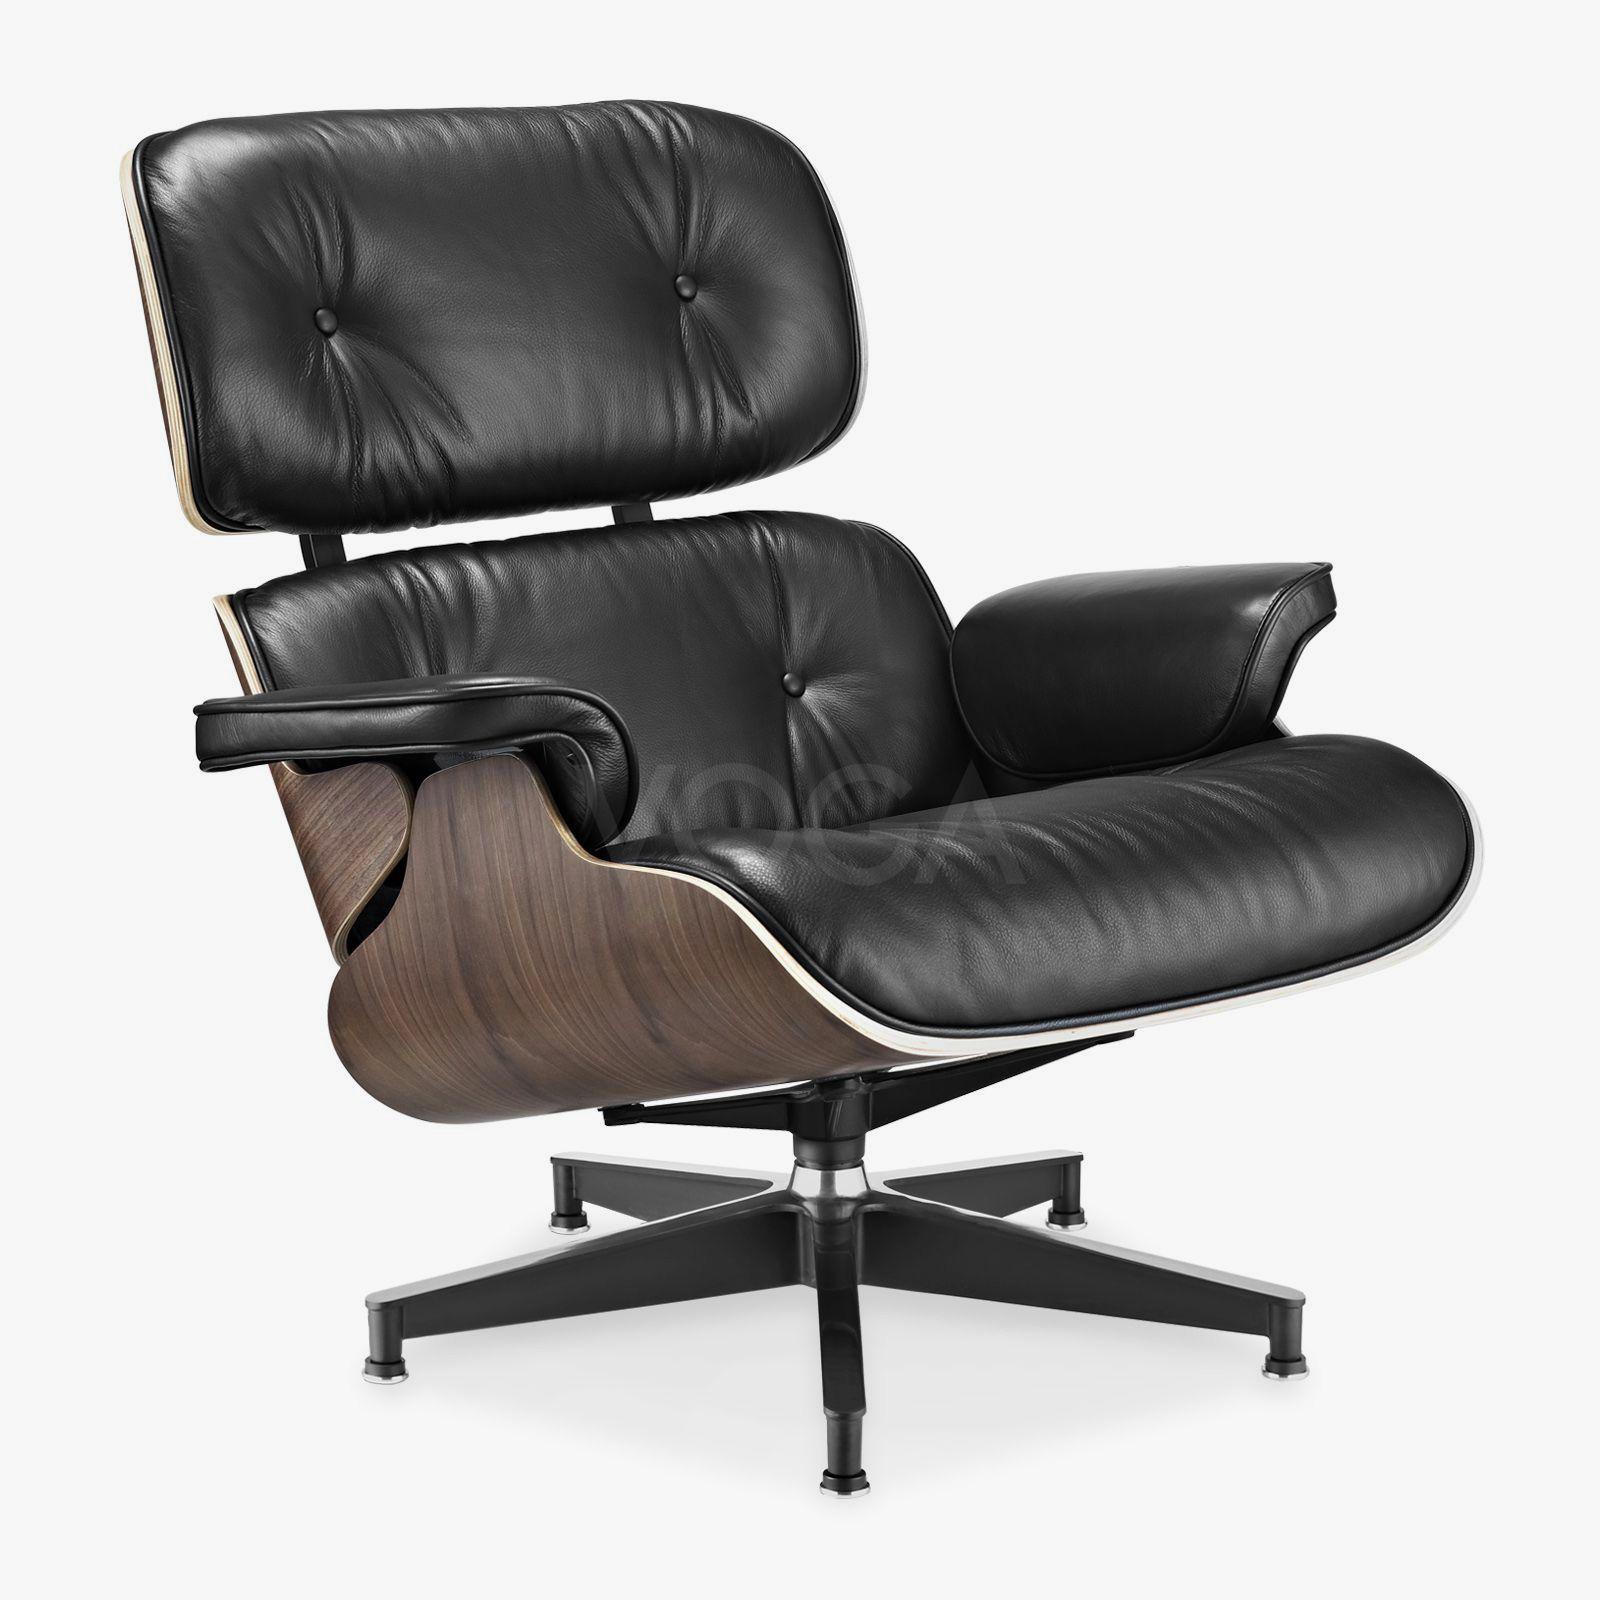 Eames Lounge 670 Chair Designer Chairs Voga Stuhl Design Lounge Eames